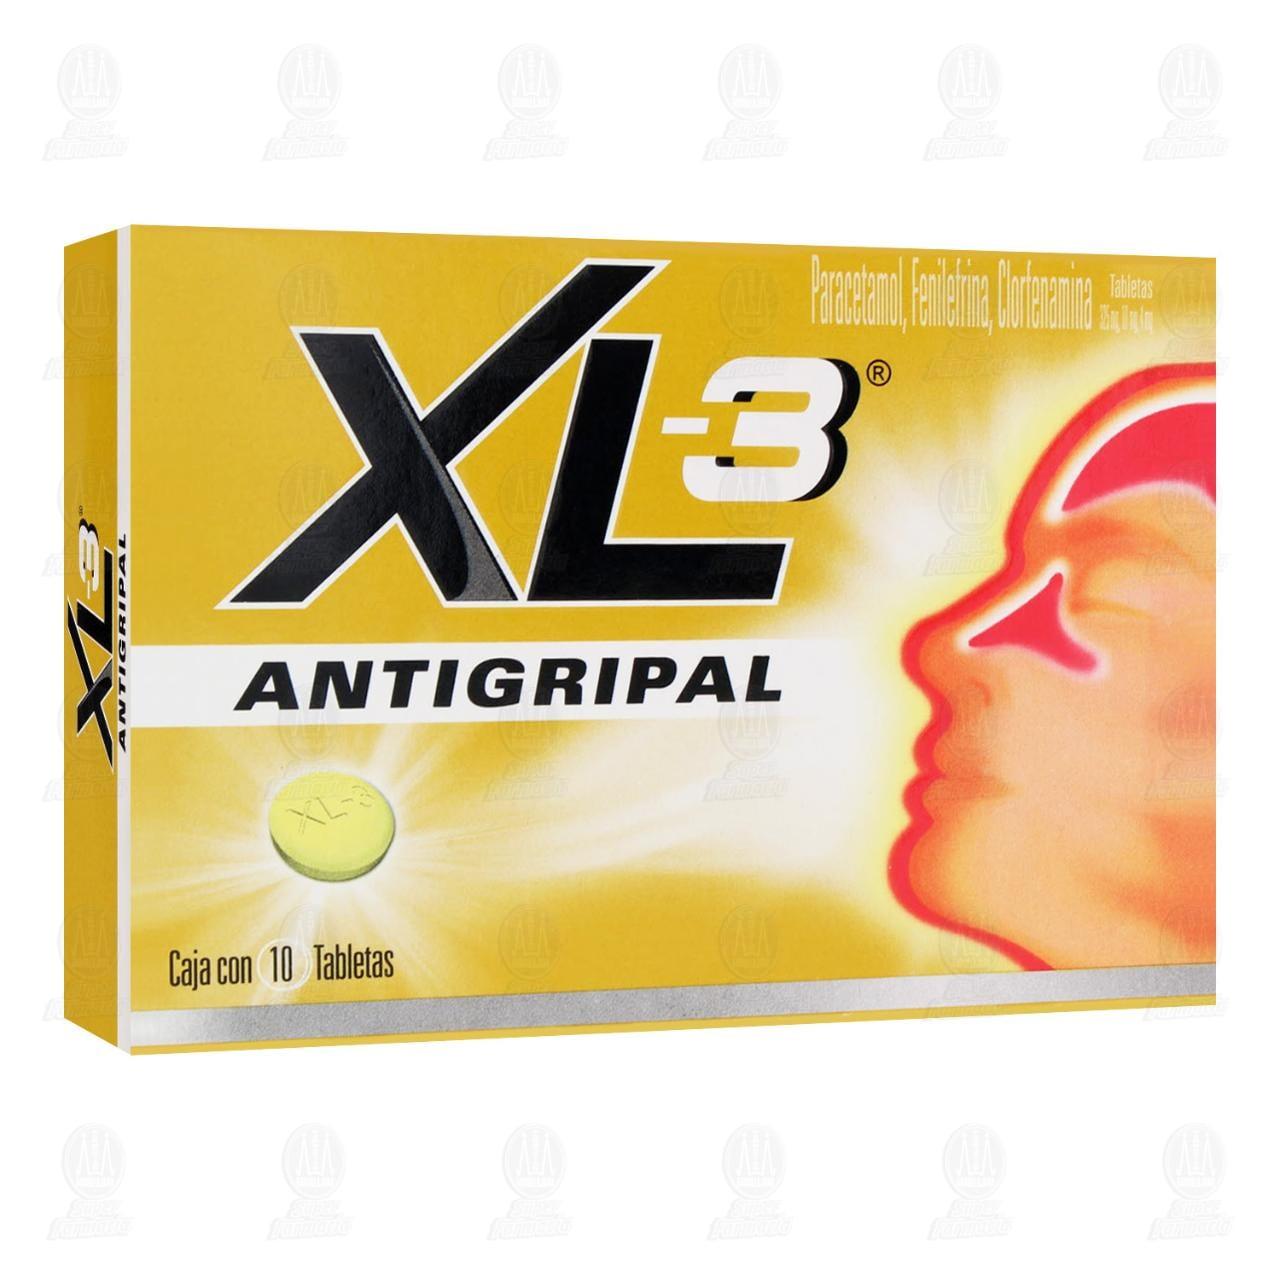 Comprar XL-3 Antigripal 325mg/10mg/4mg 10 Tabletas en Farmacias Guadalajara